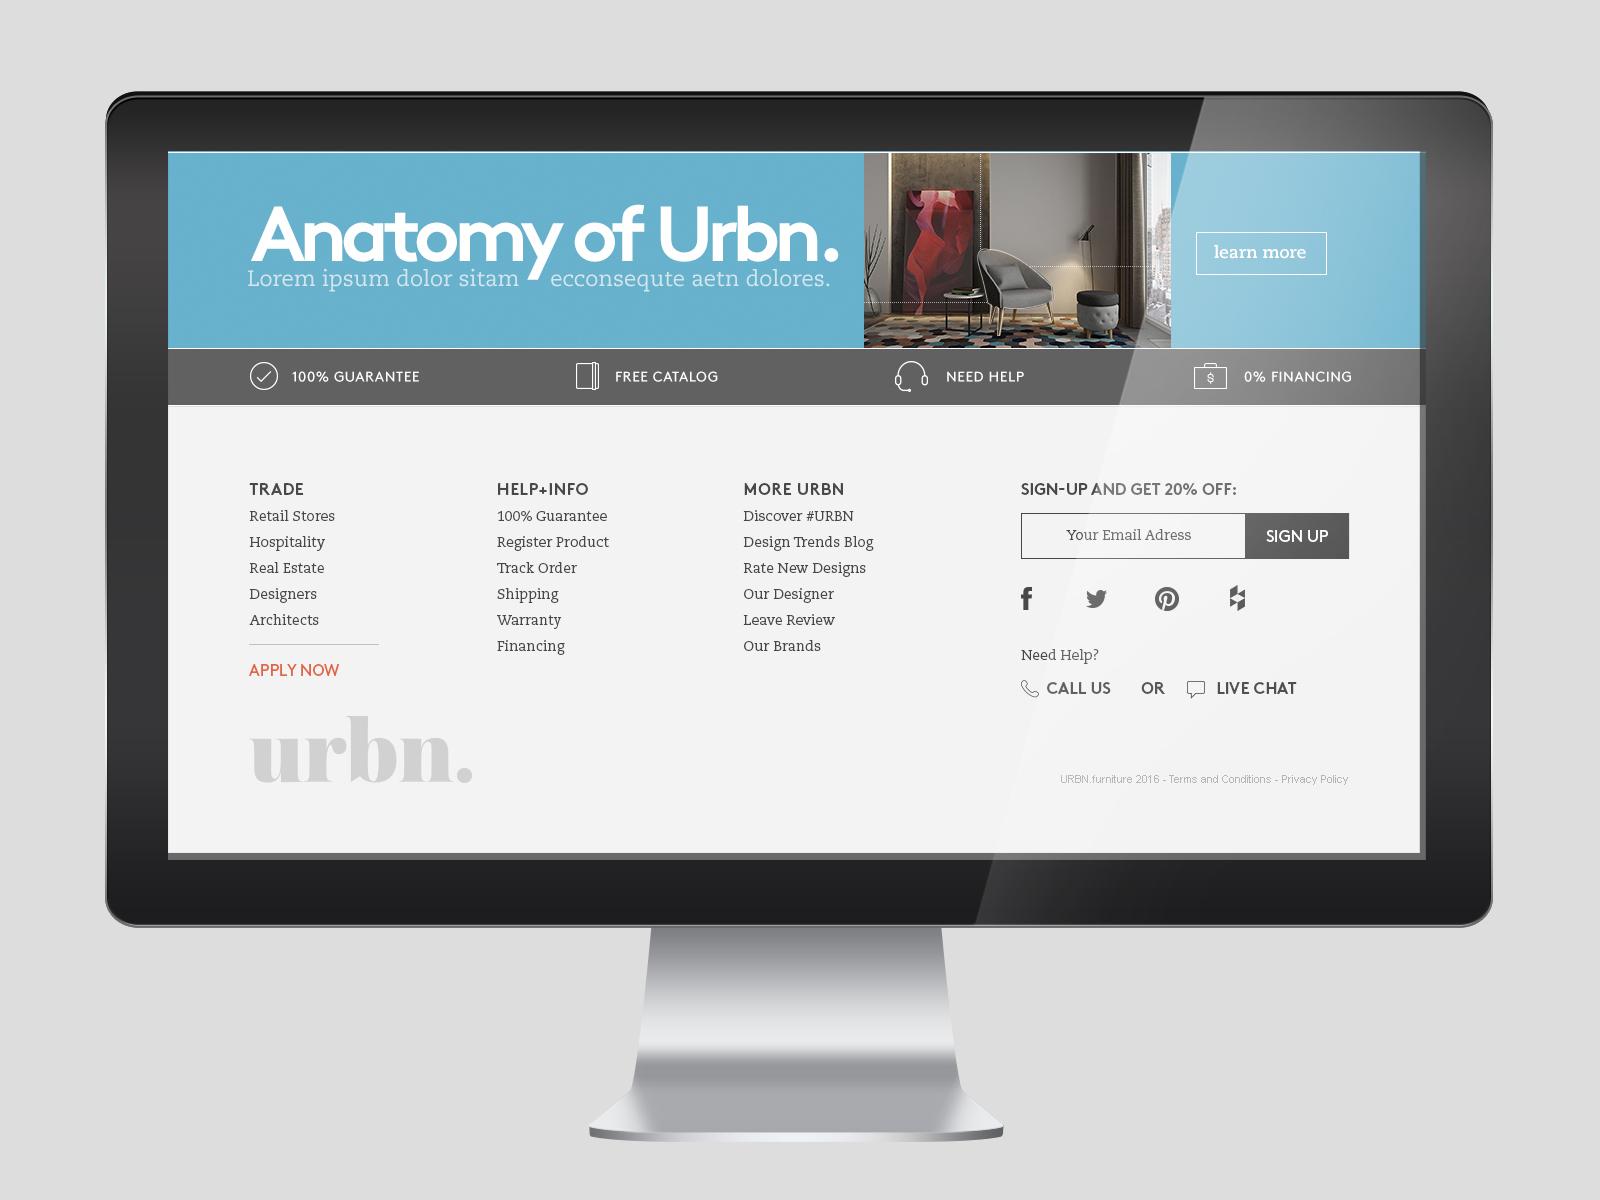 urbn1